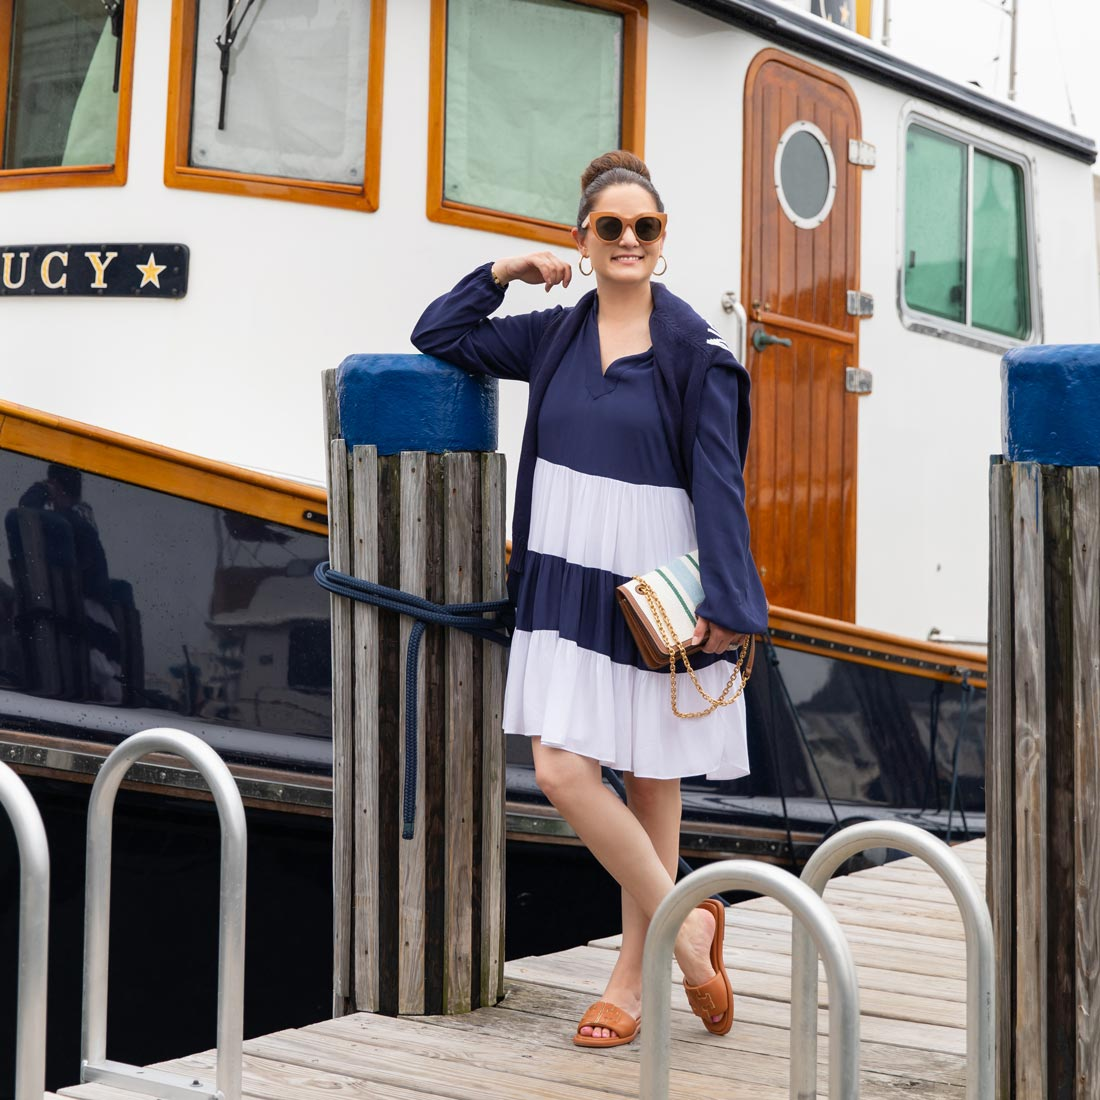 Sail to Sable Nantucket